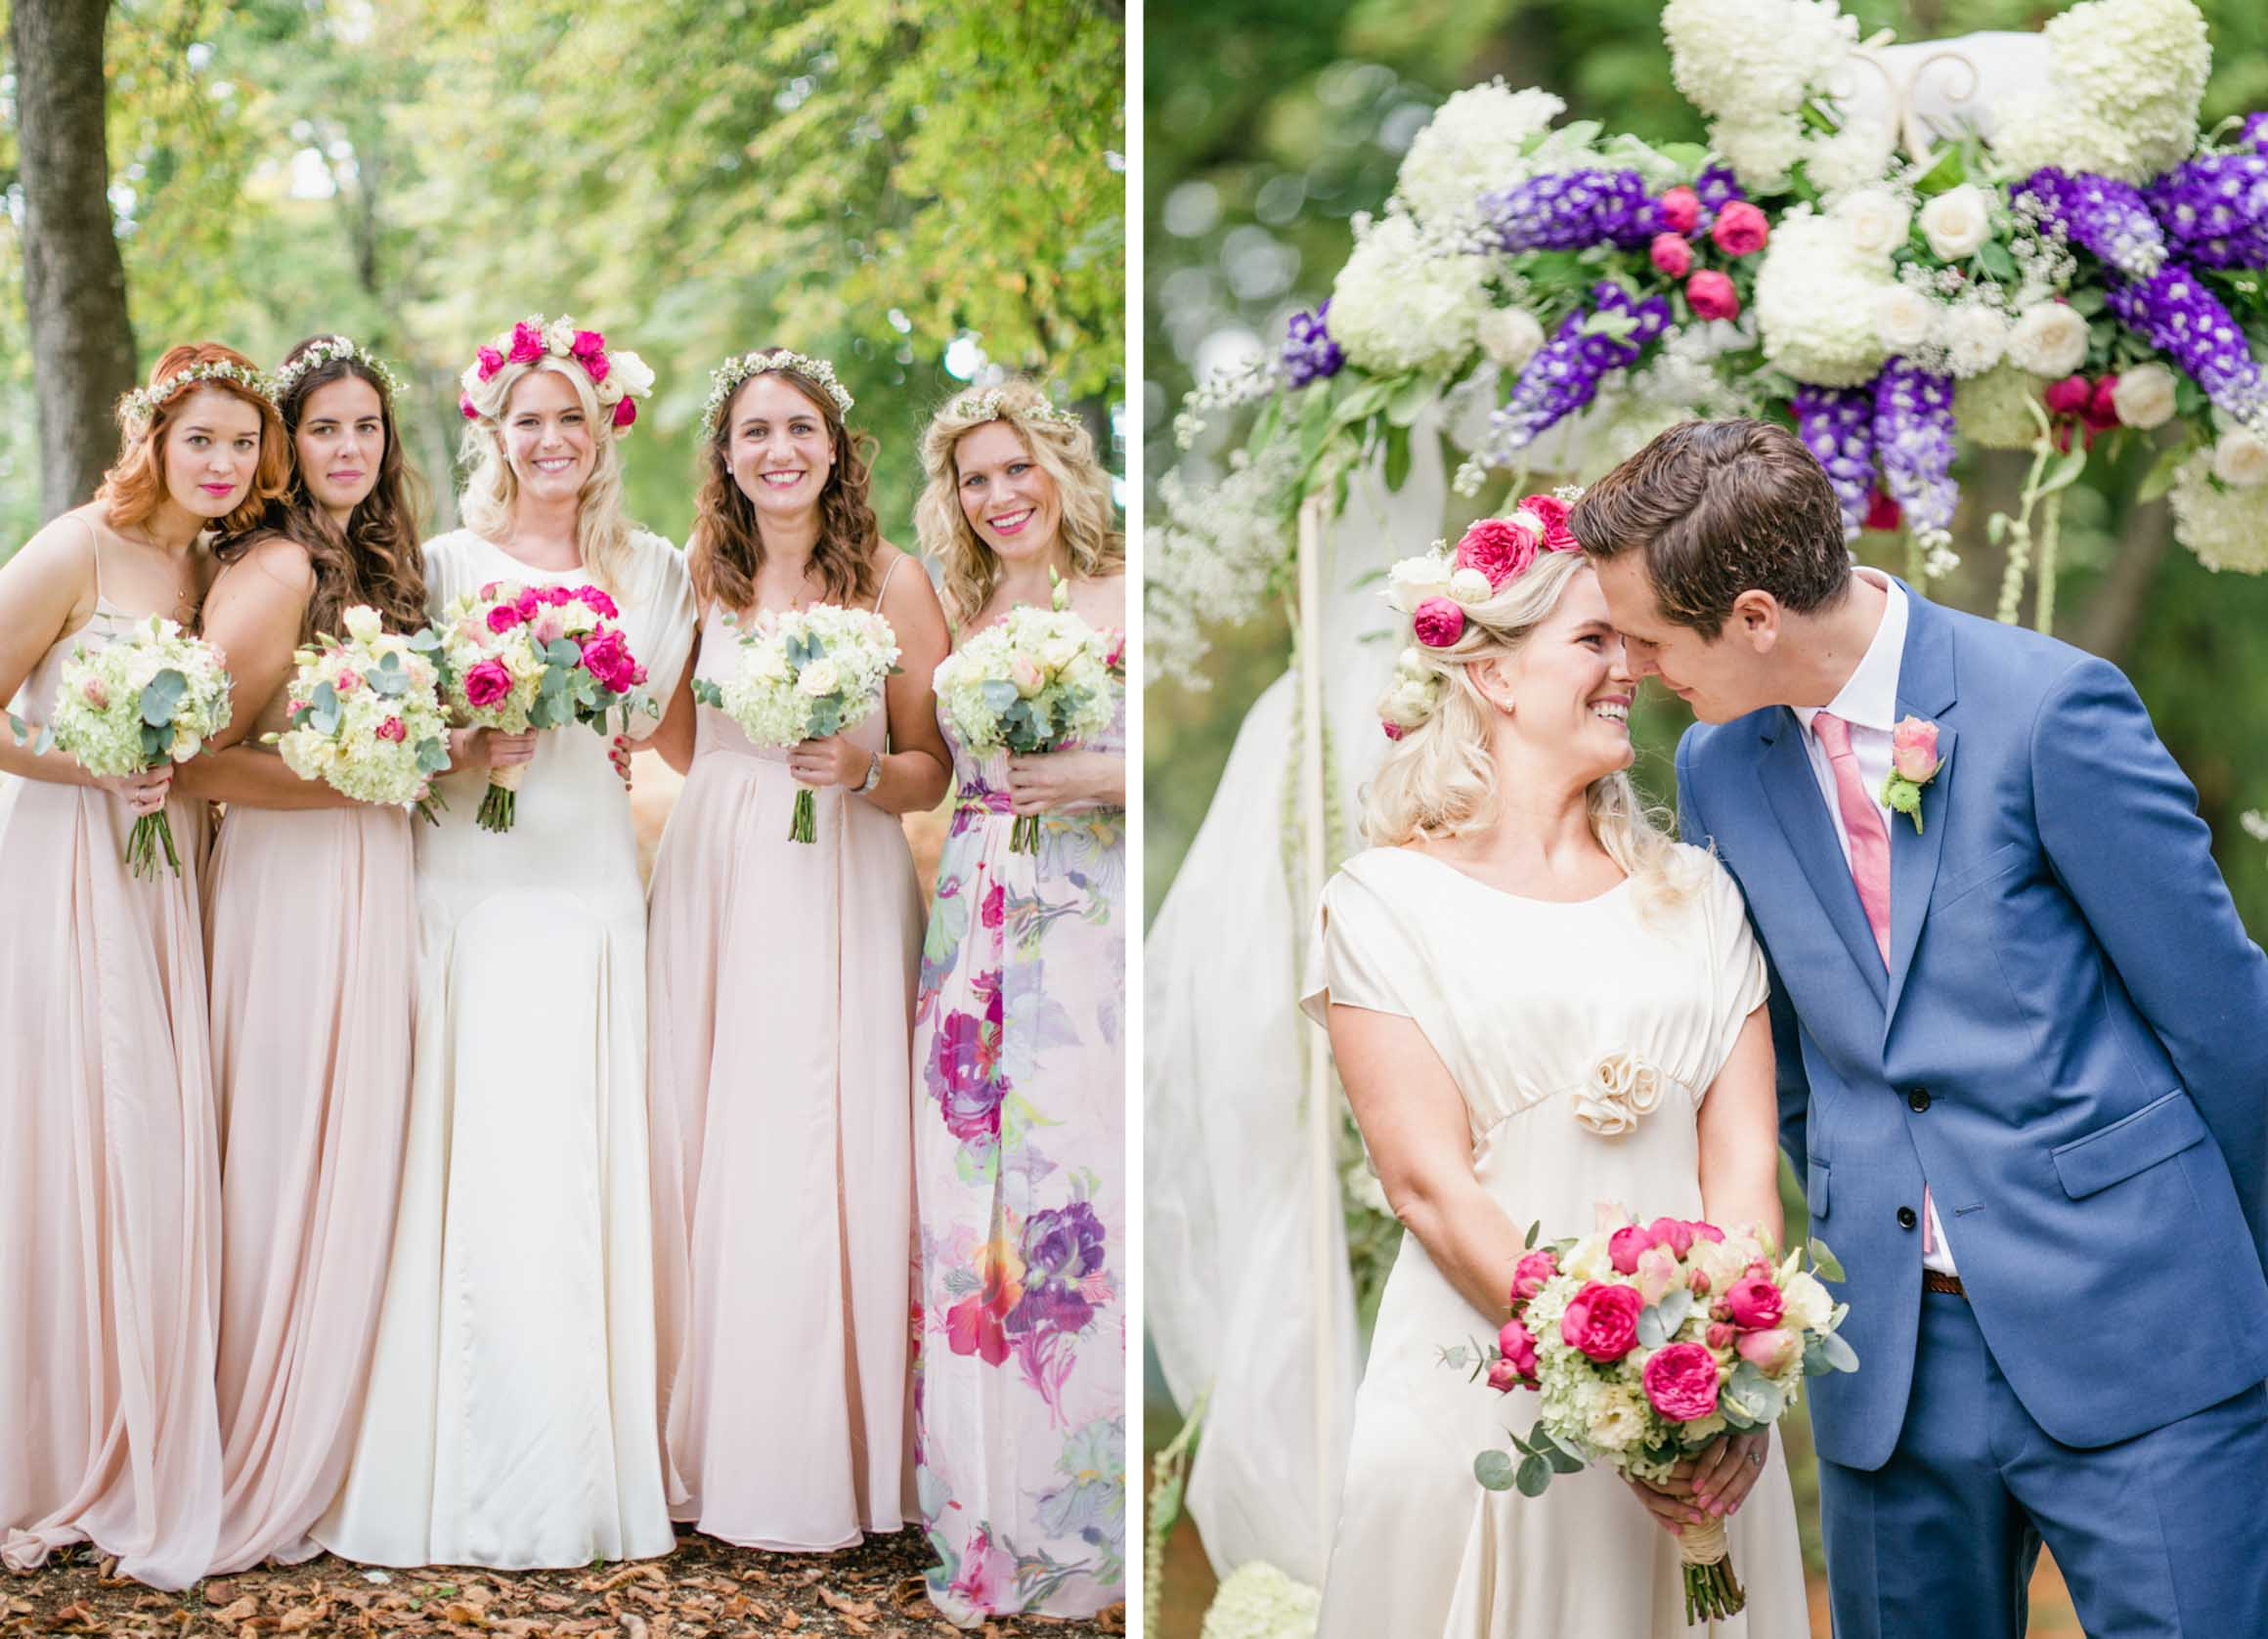 Amy O'Boyle Photography, Destination & UK Fine Art Film Wedding Photographer, Chateau Cazenac Wedding, France Dordogne Wedding Photographer 5.jpg